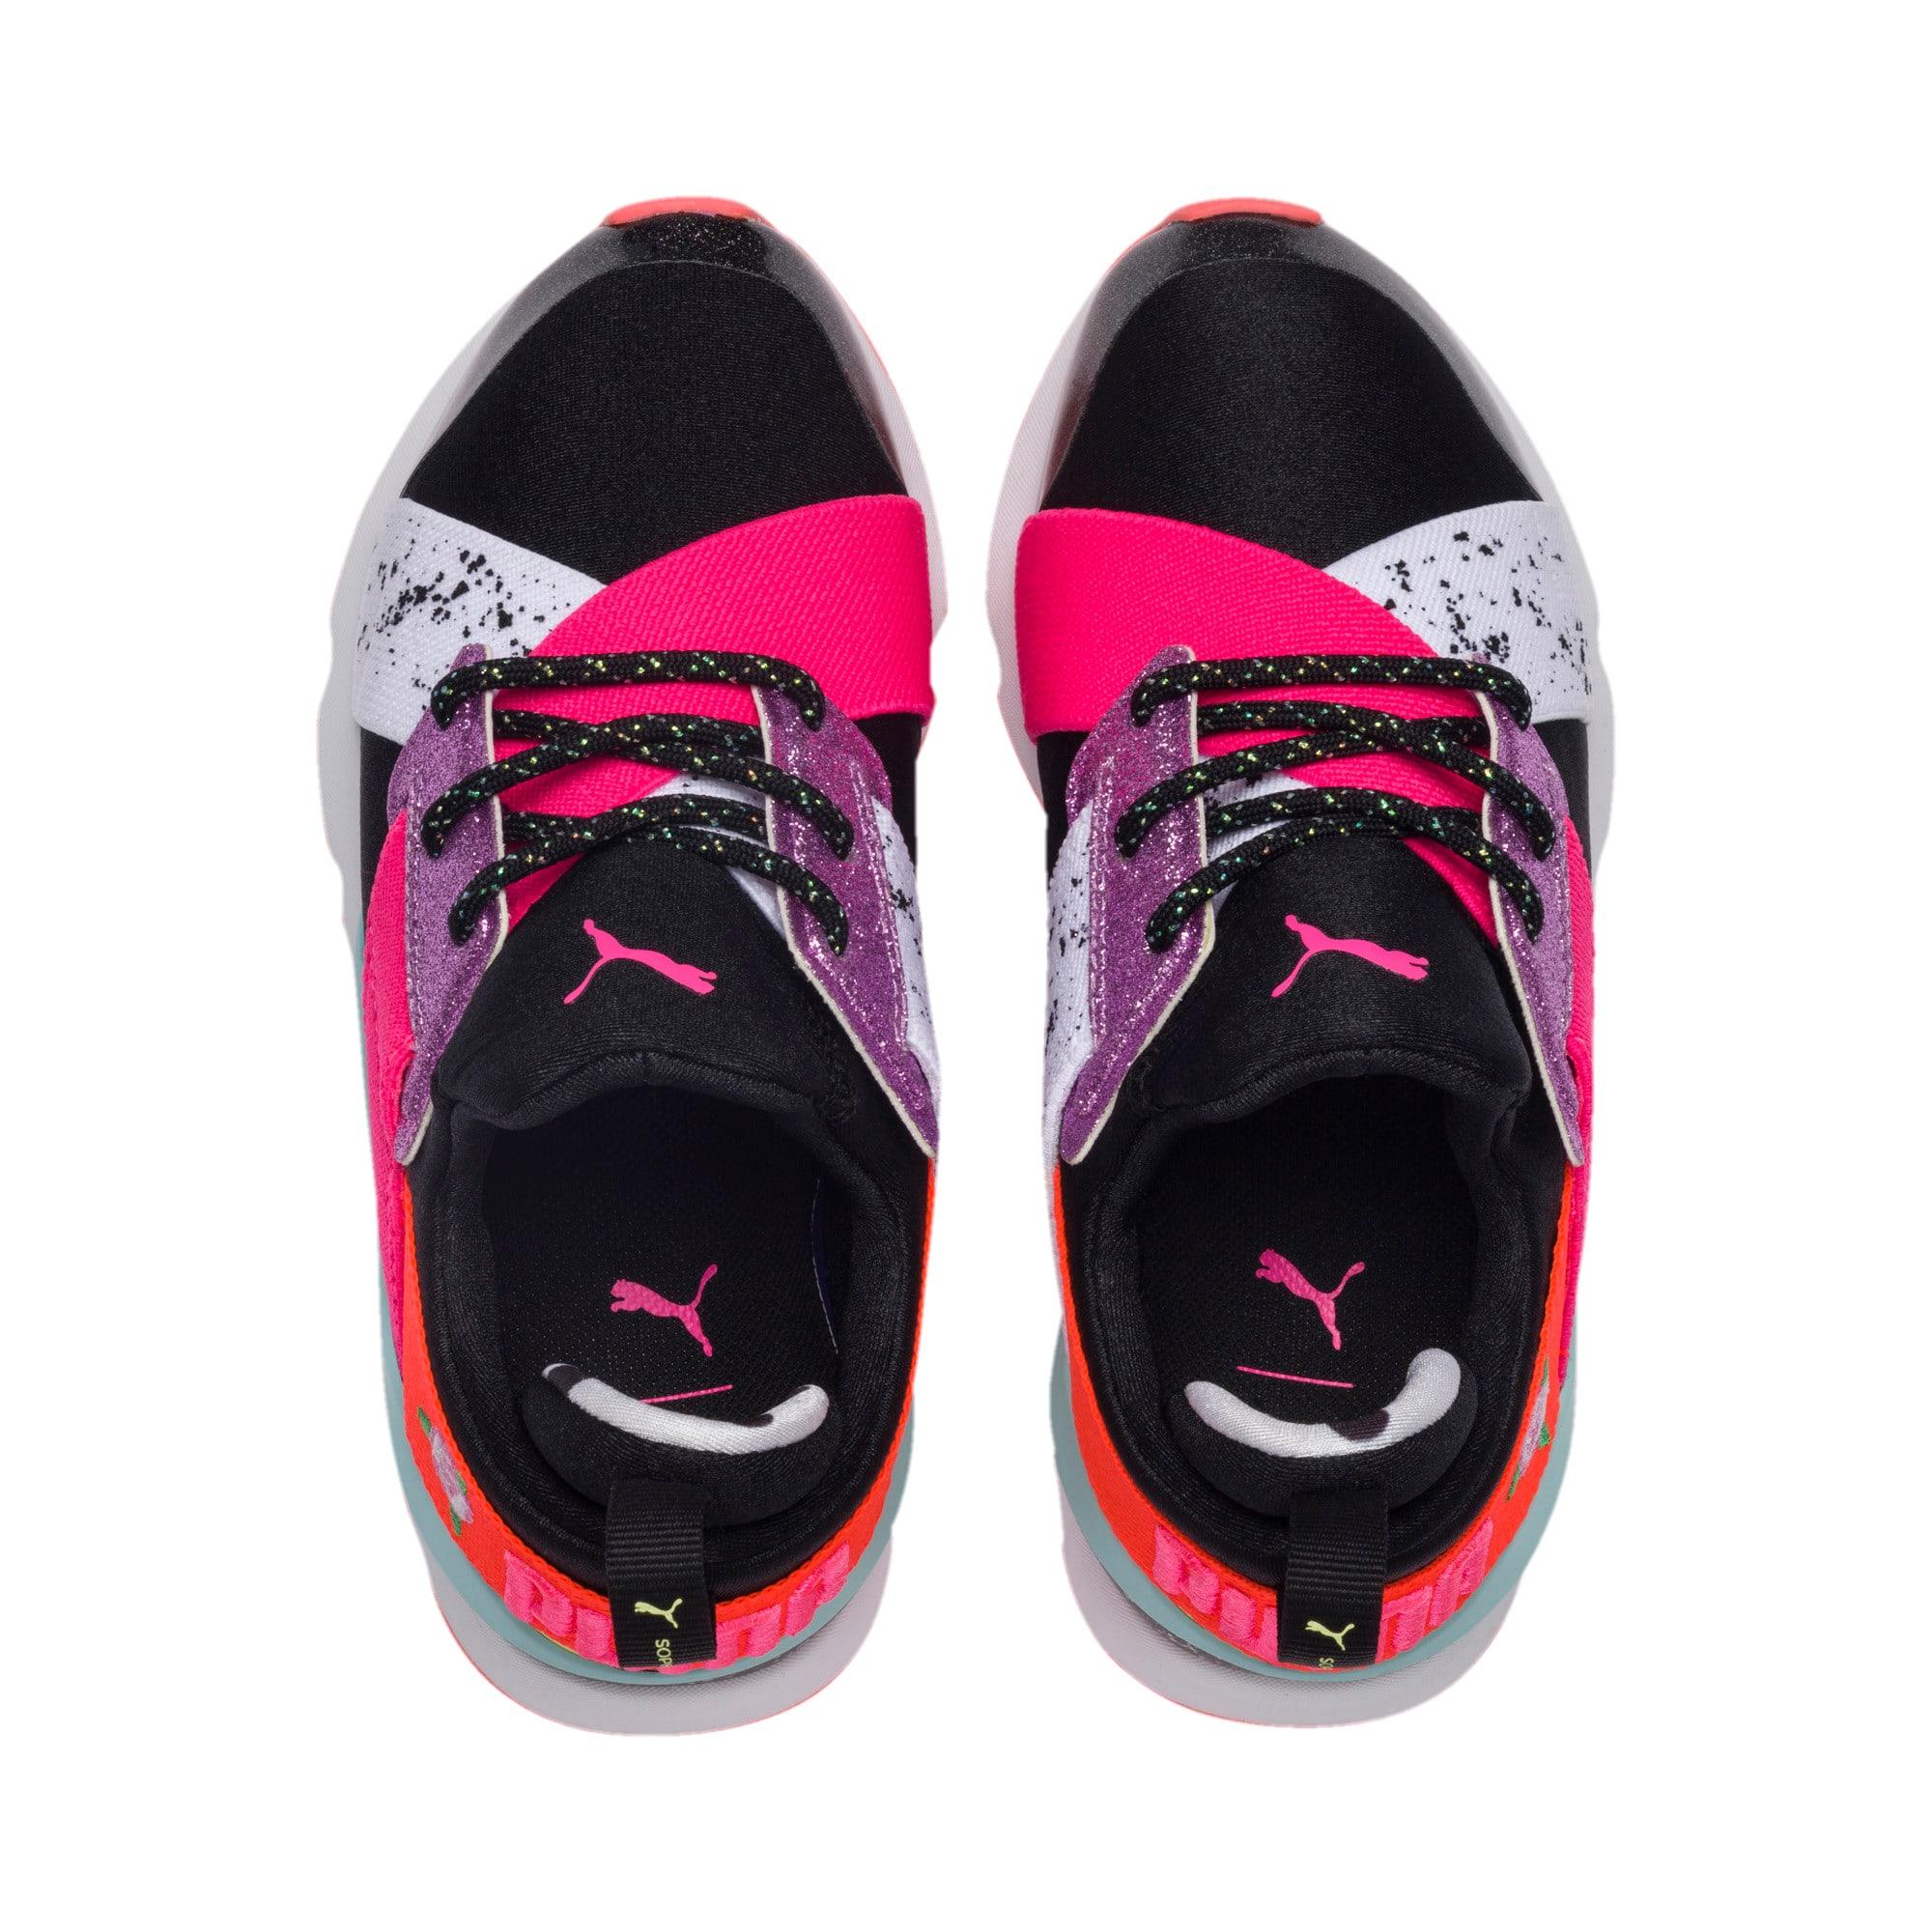 Thumbnail 6 of PUMA x SOPHIA WEBSTER Muse Little Kids' Shoes, Puma Black-Puma White, medium